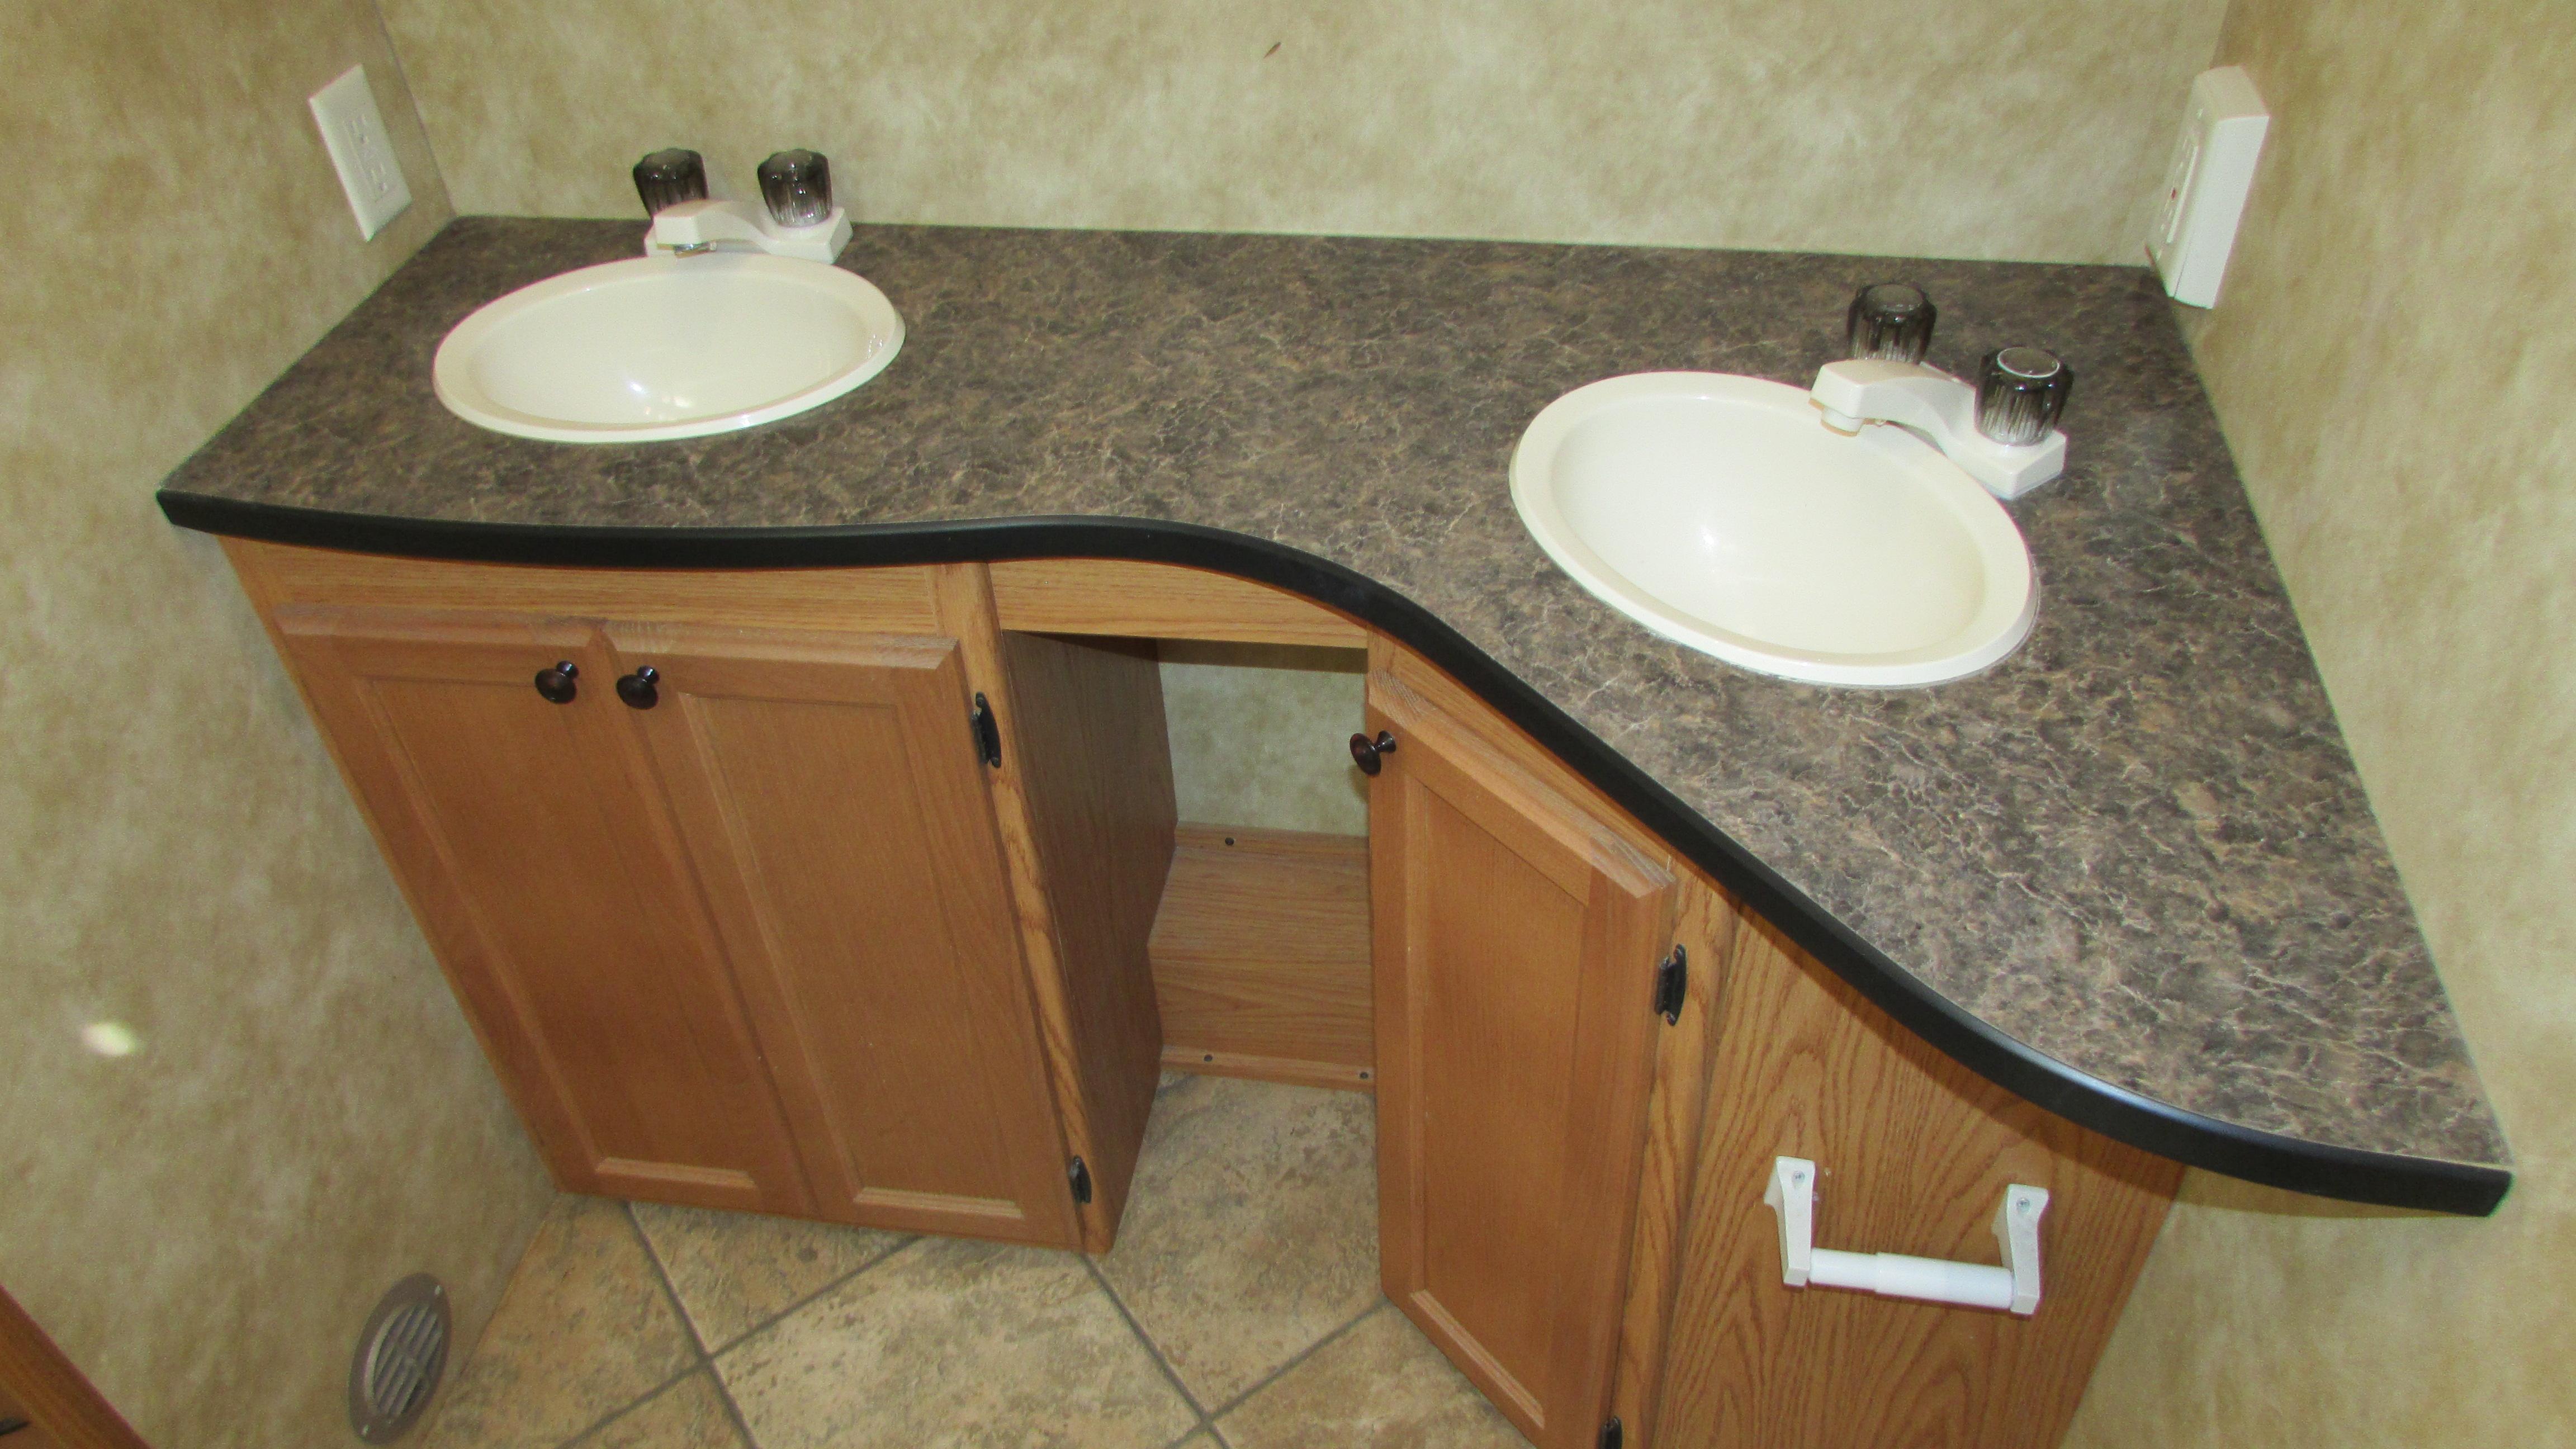 2010 Heartland North Trail 29 Rbss Travel Trailer Slide Huge Bathroom Loaded Warranty